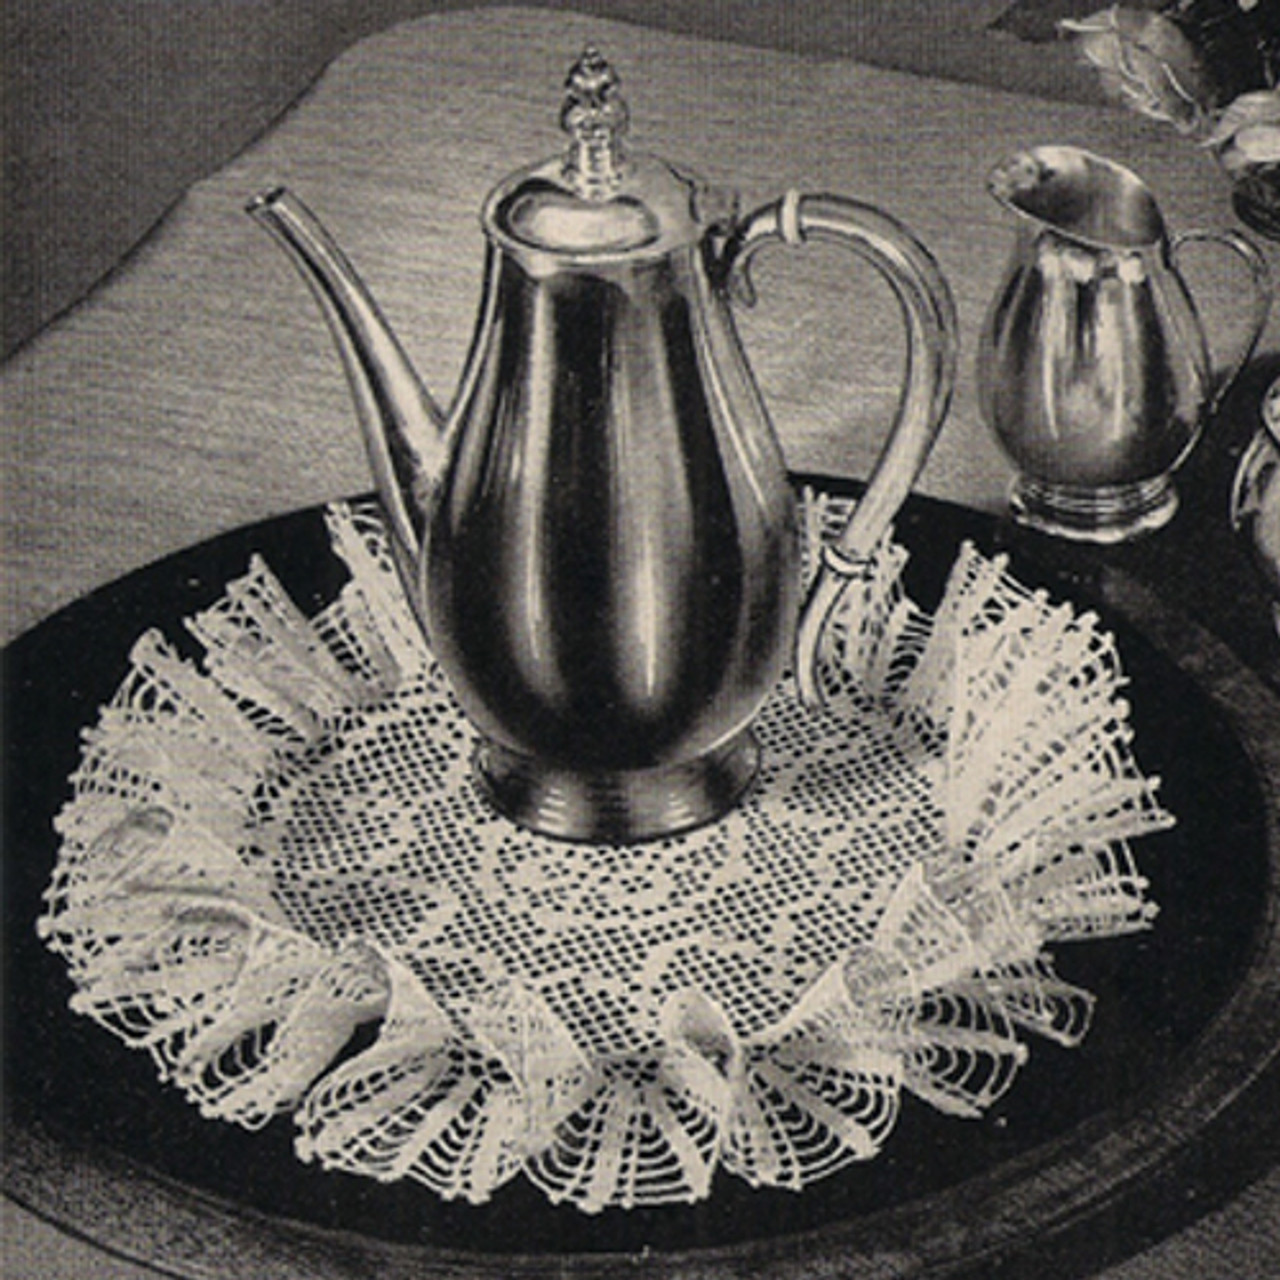 Filet Crochet Ruffled Doily pattern